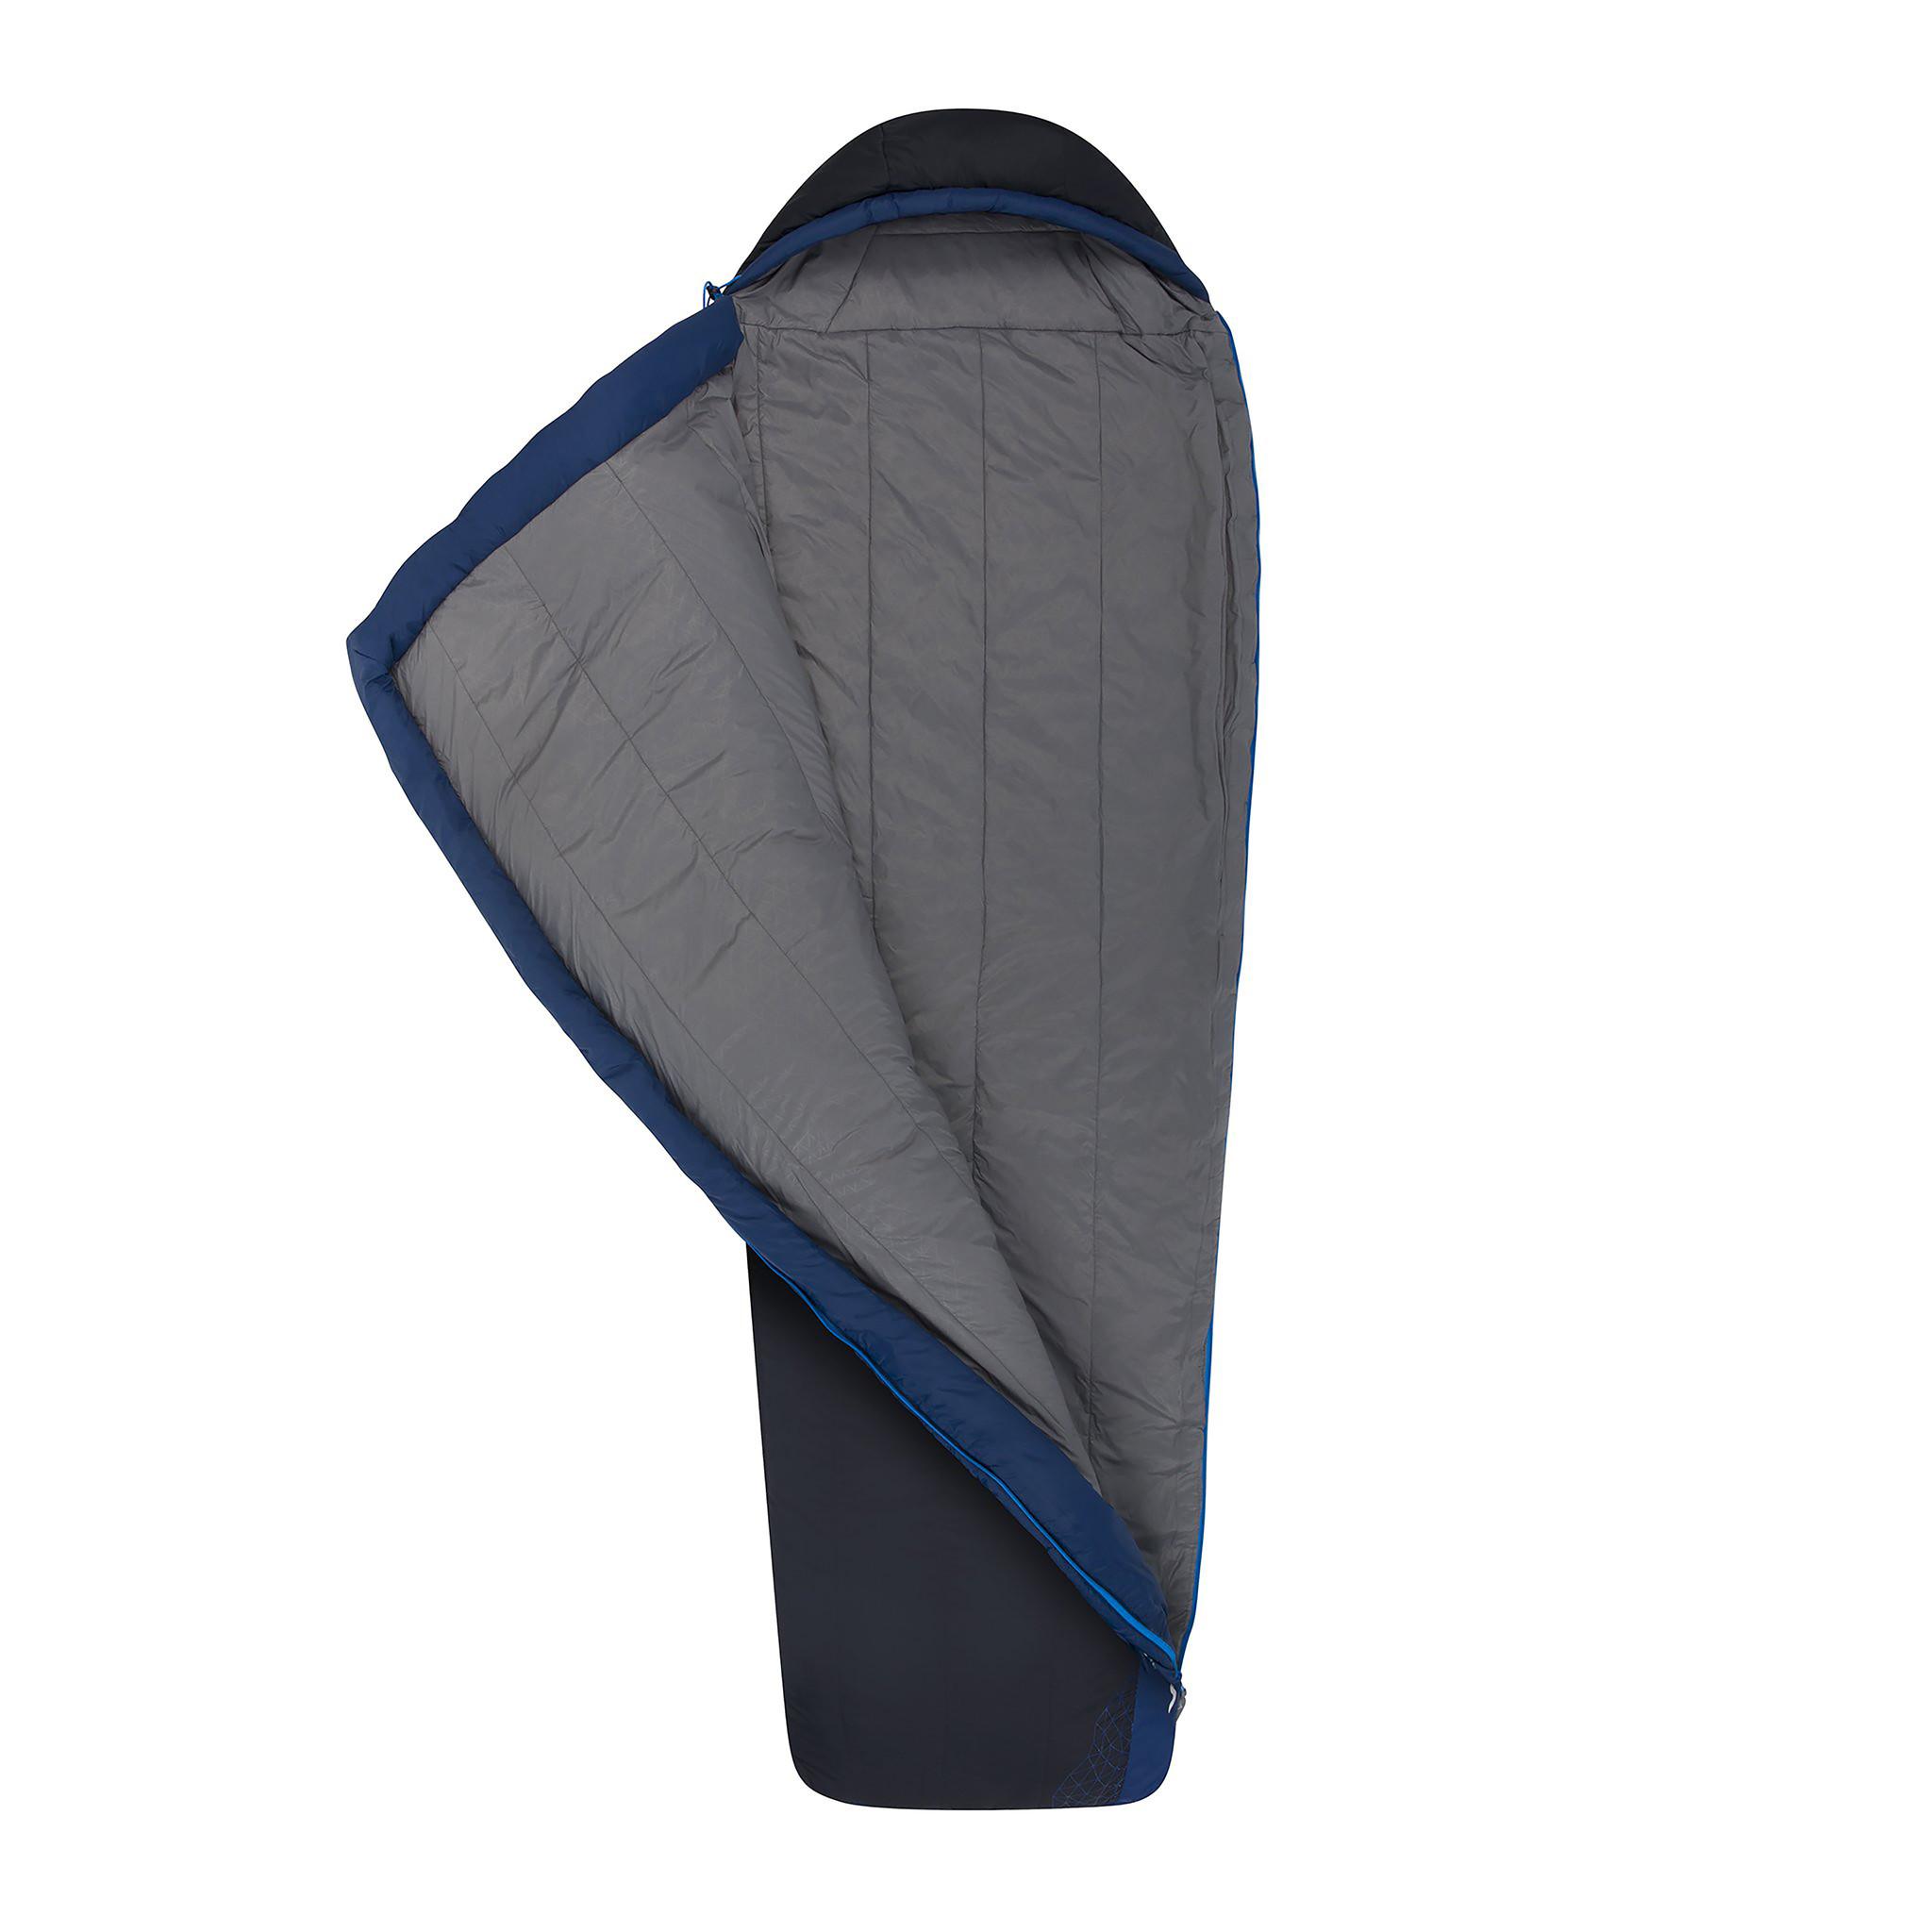 Trailhead Synthetic Sleeping Bag, 30F, Long-2